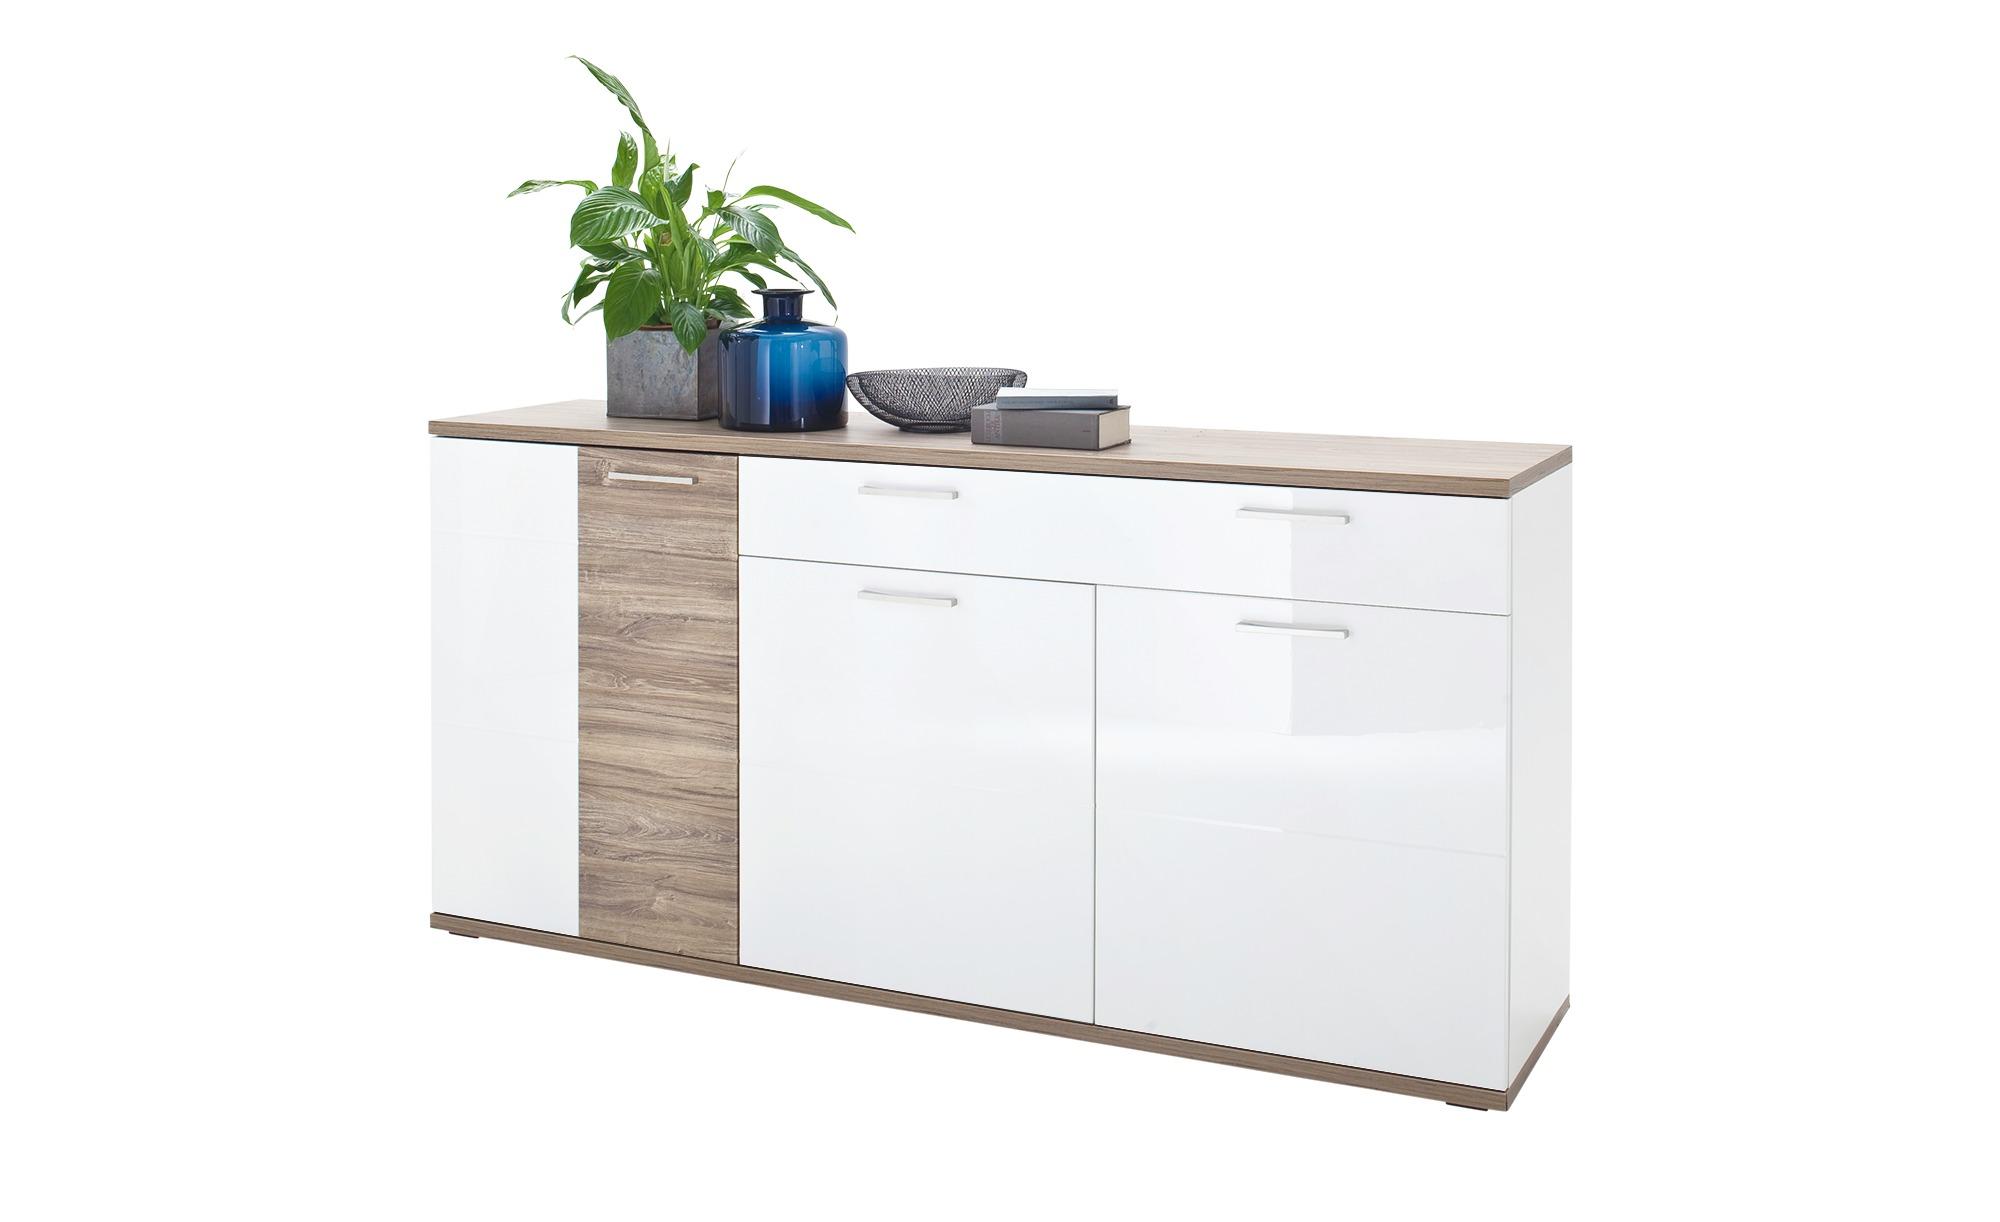 Sideboard  Zypern ¦ weiß ¦ Maße (cm): B: 180 H: 86 T: 43 Kommoden & Sideboards > Sideboards - Höffner